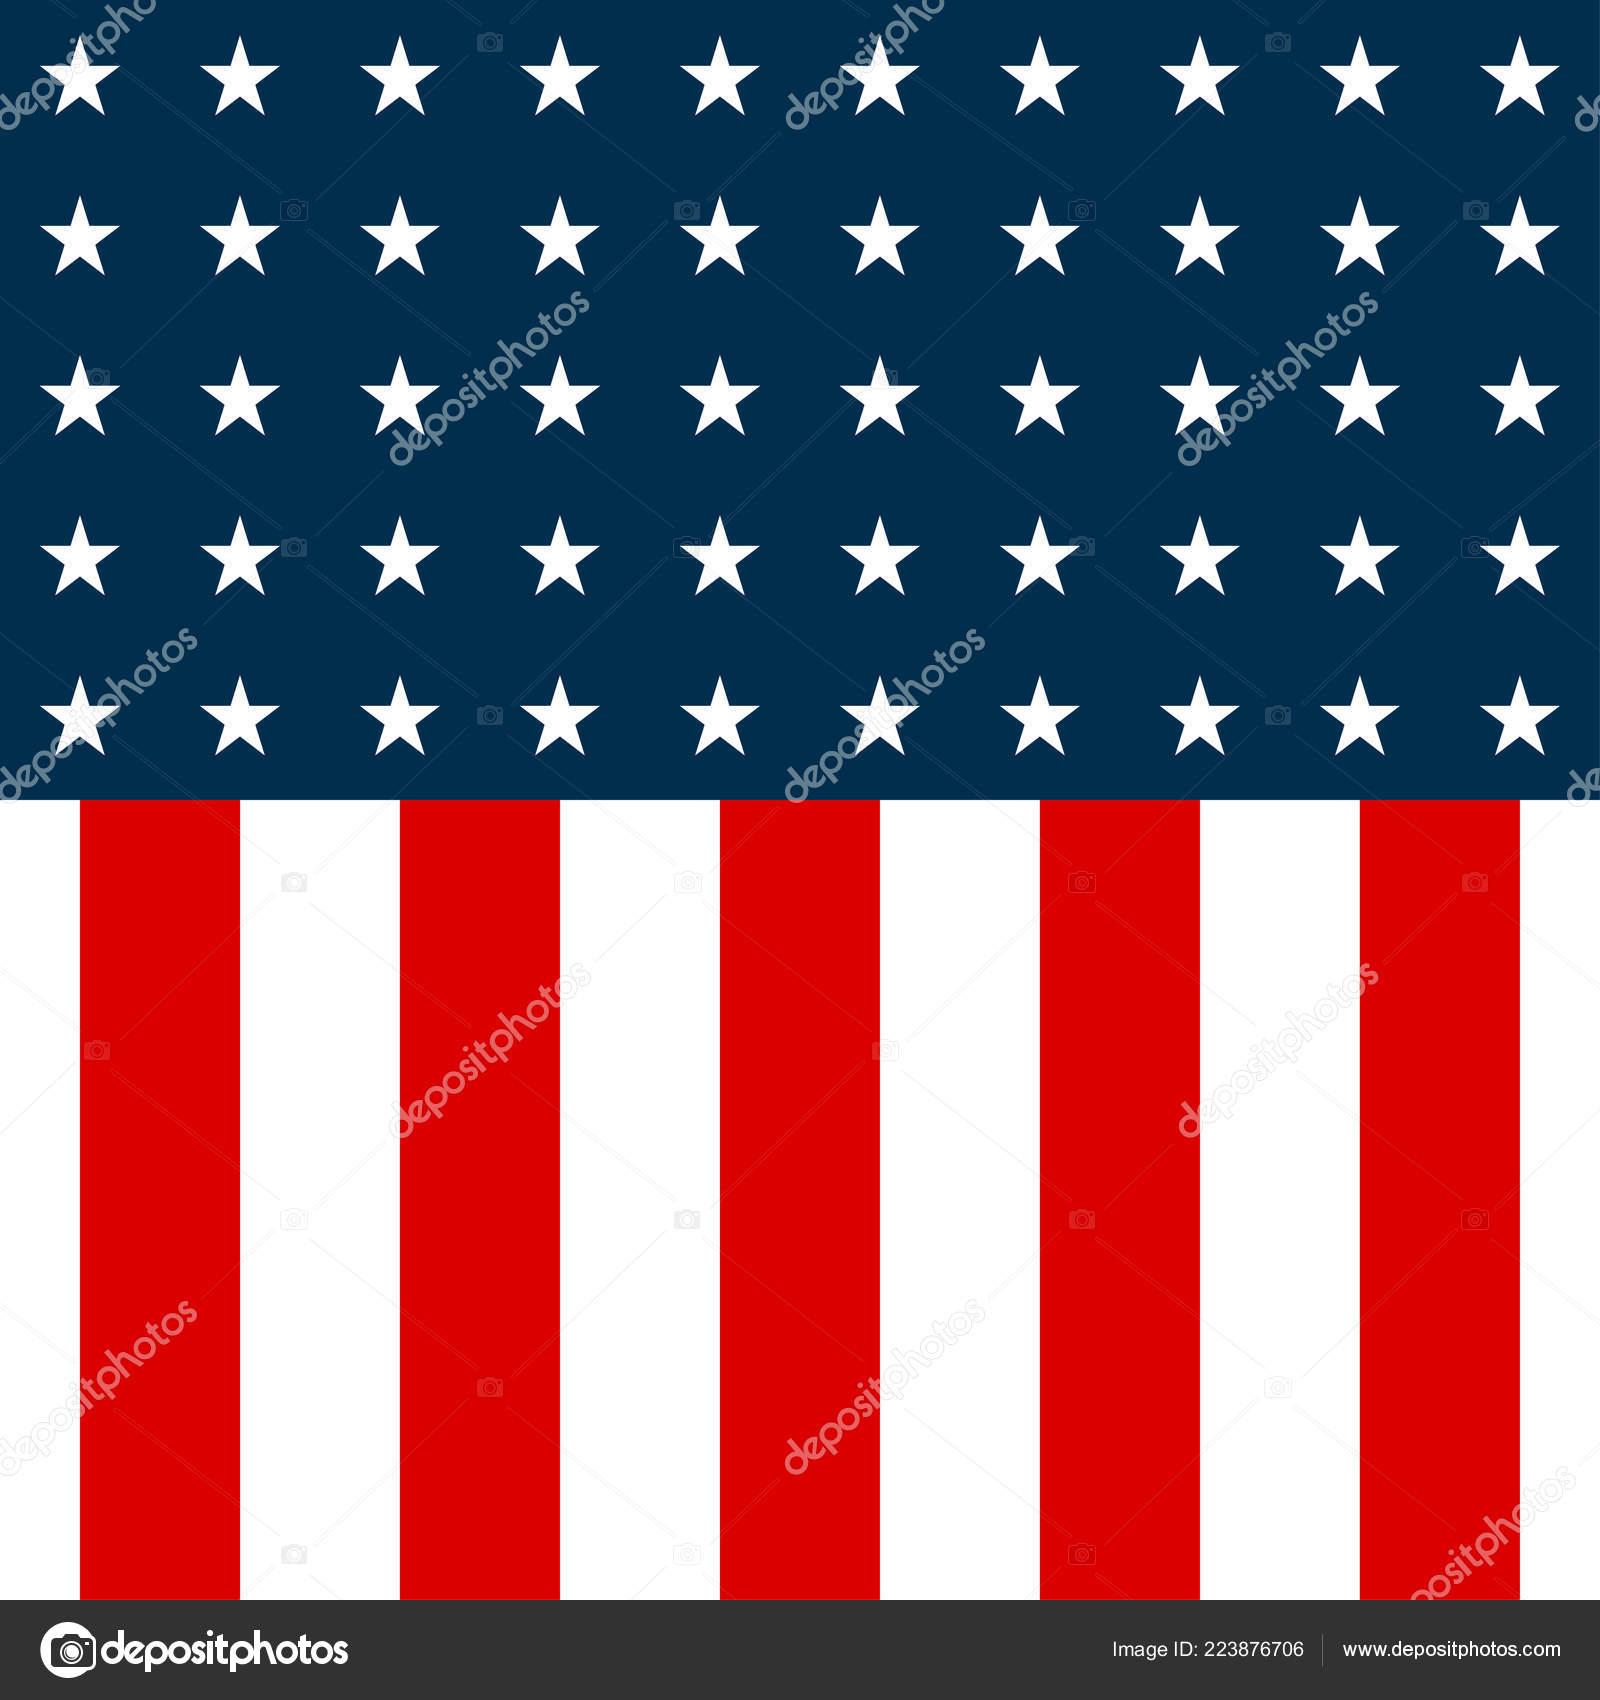 usa flag american flag background white stars blue background red